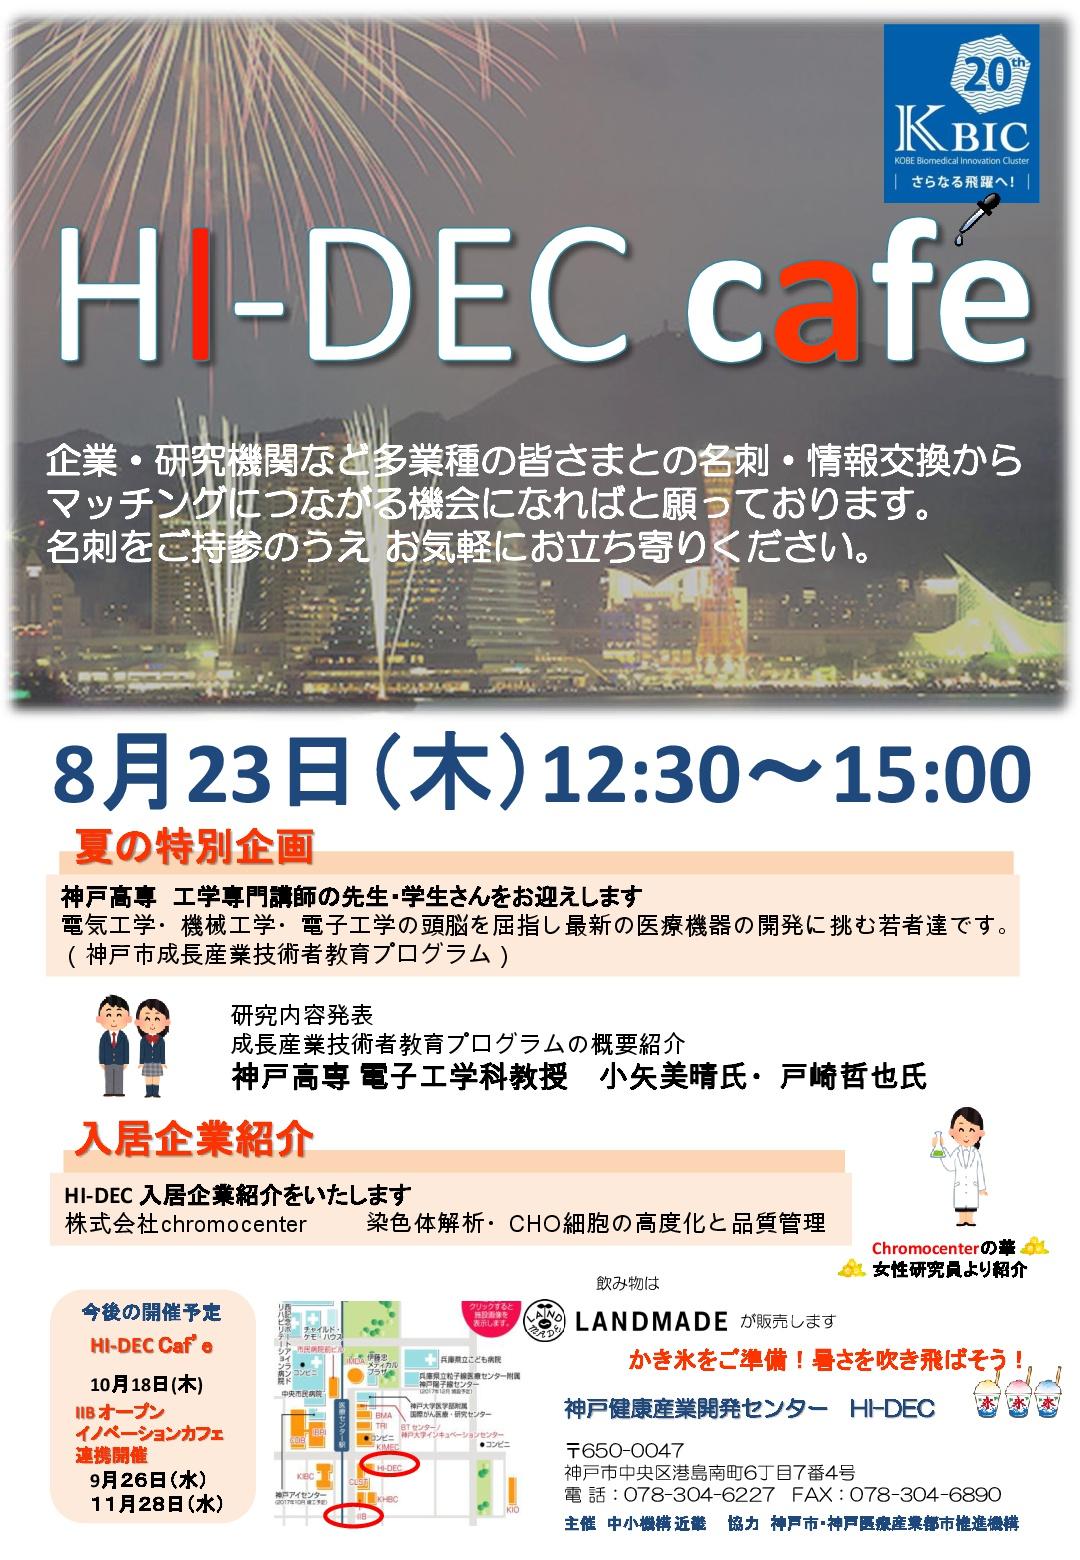 HI-DEC Cafe 8月|公益財団法人神戸医療産業都市推進機構